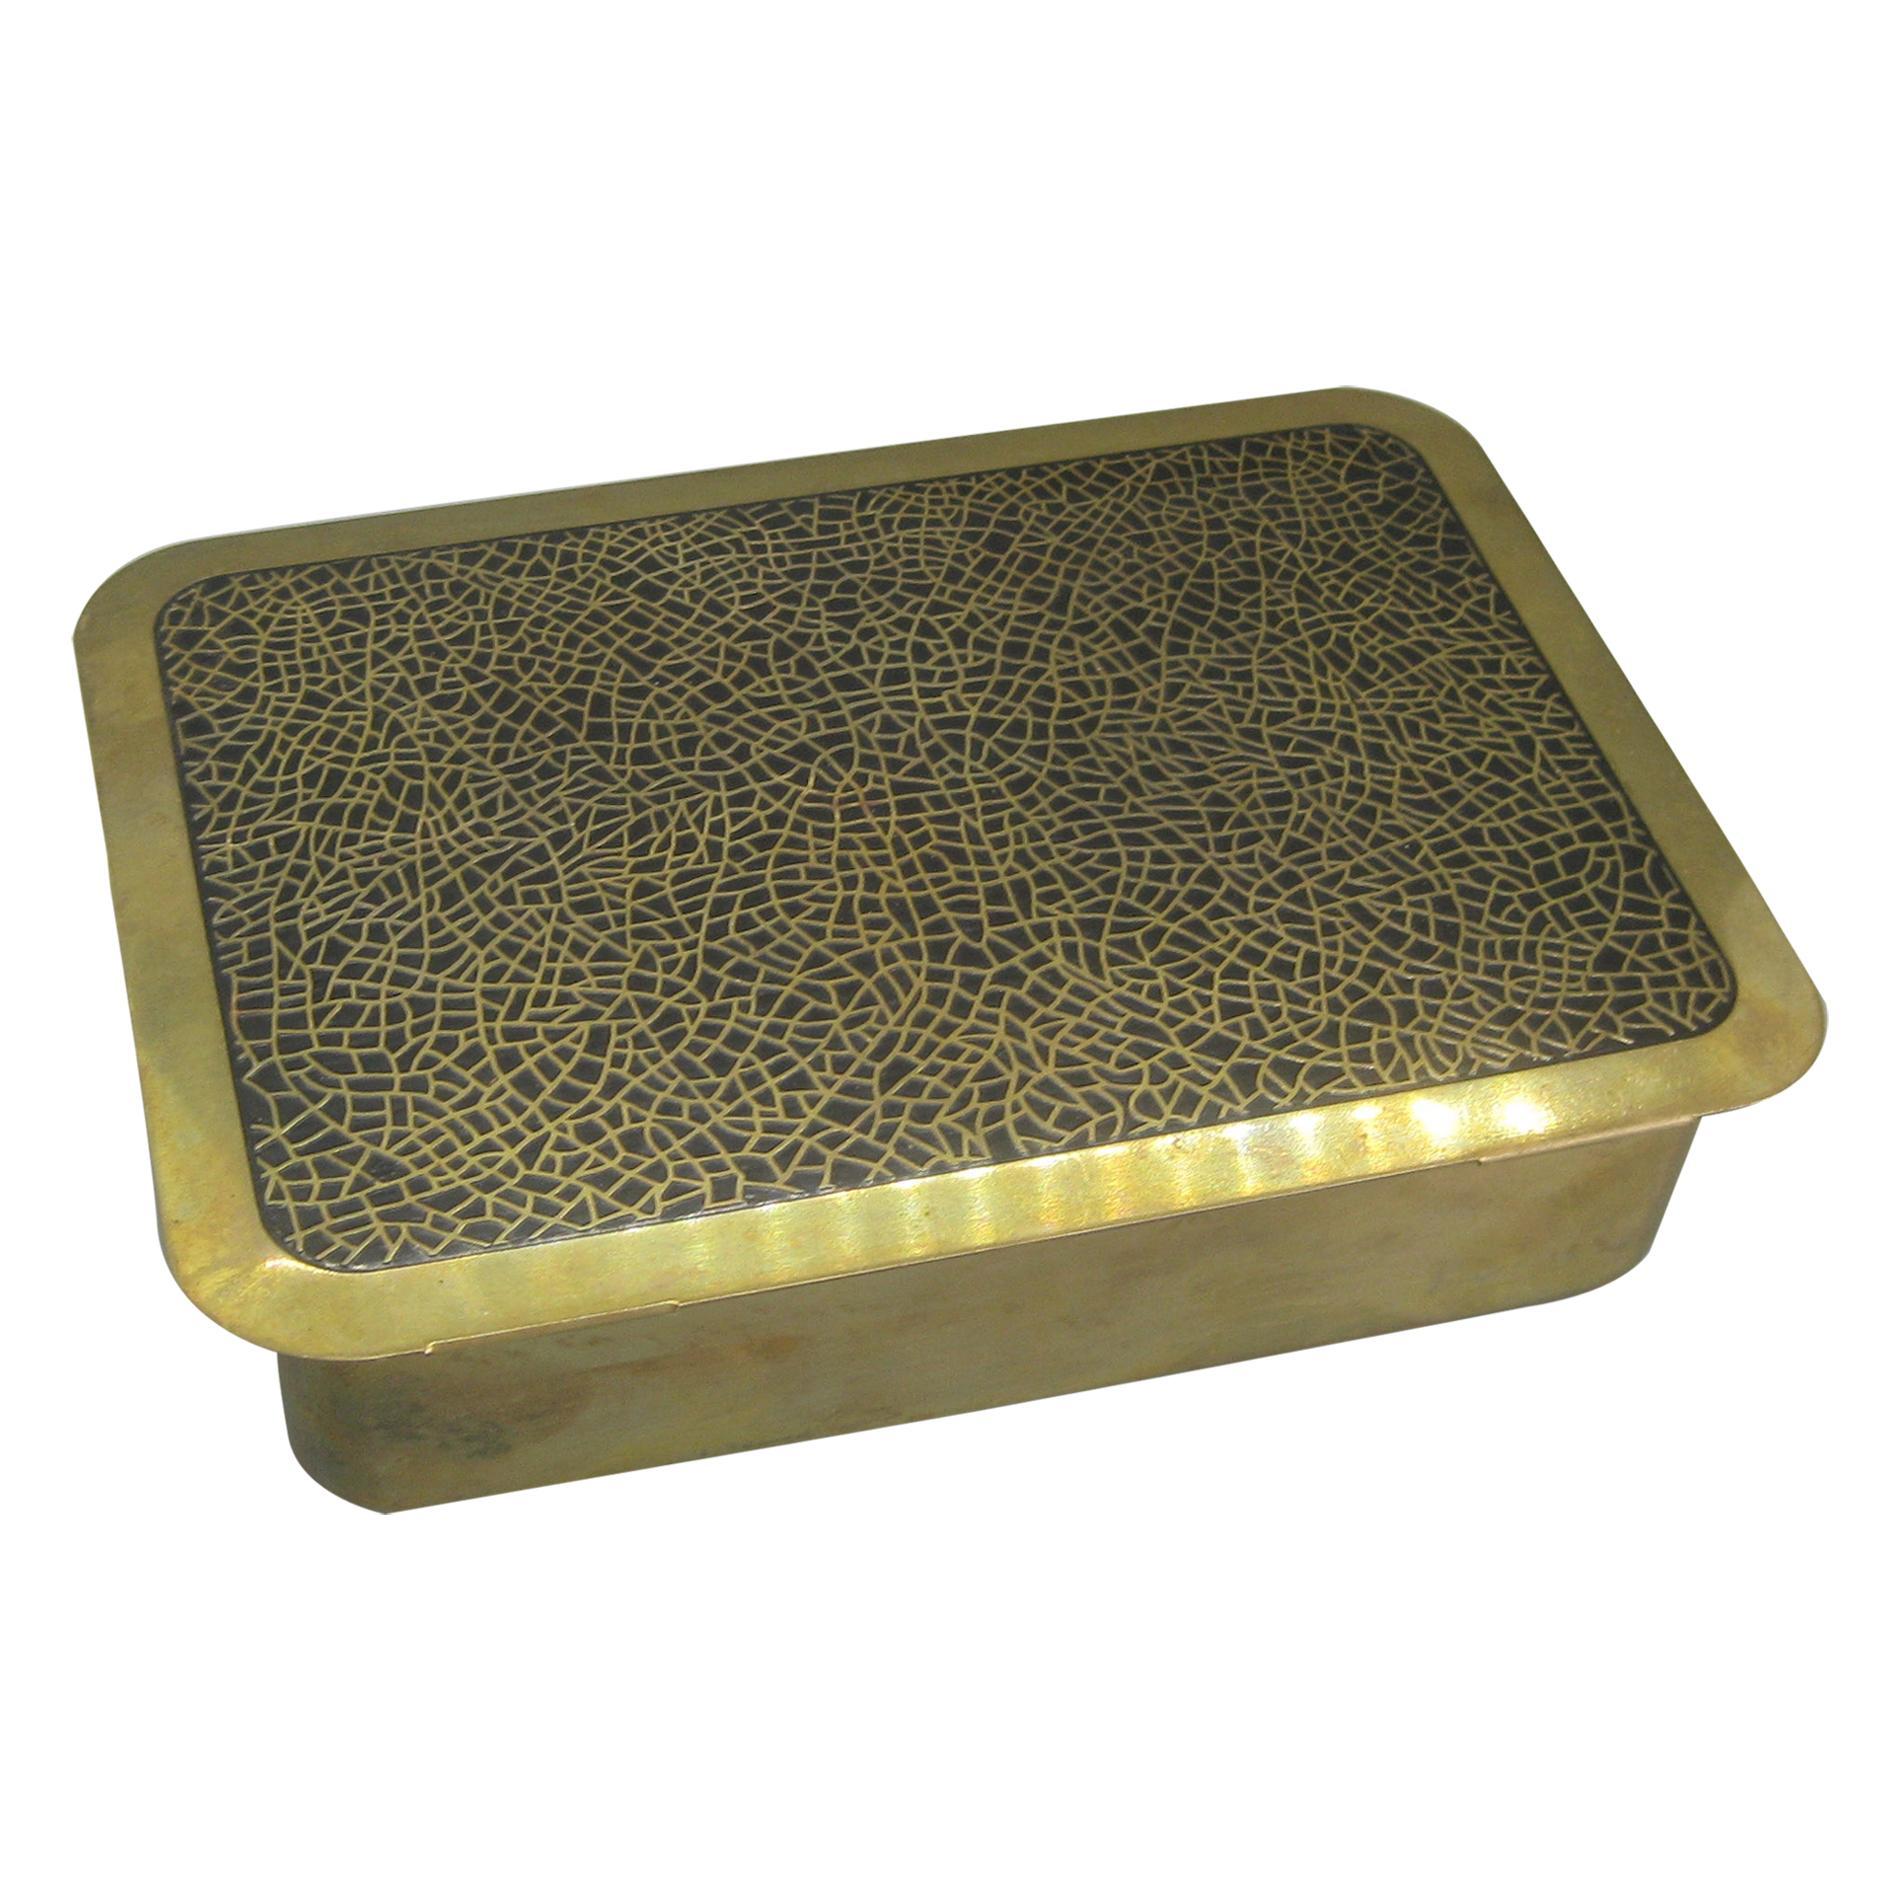 Art Deco Brass & Black Enamel Desk Stash Jewelry Trinket Box w/Wood Liner